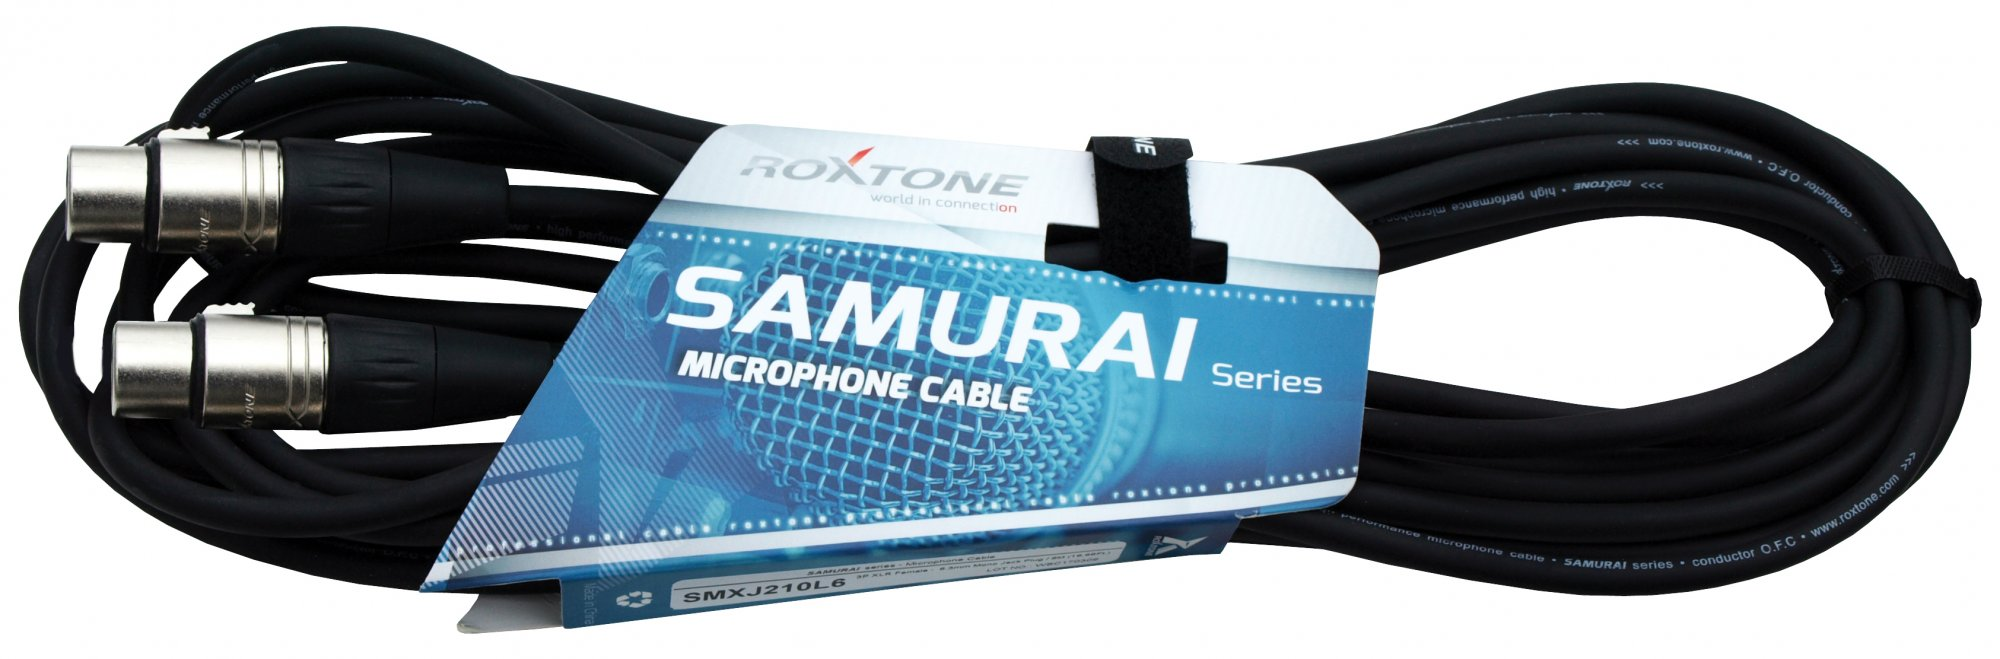 Roxtone Samurai SMXX200L1